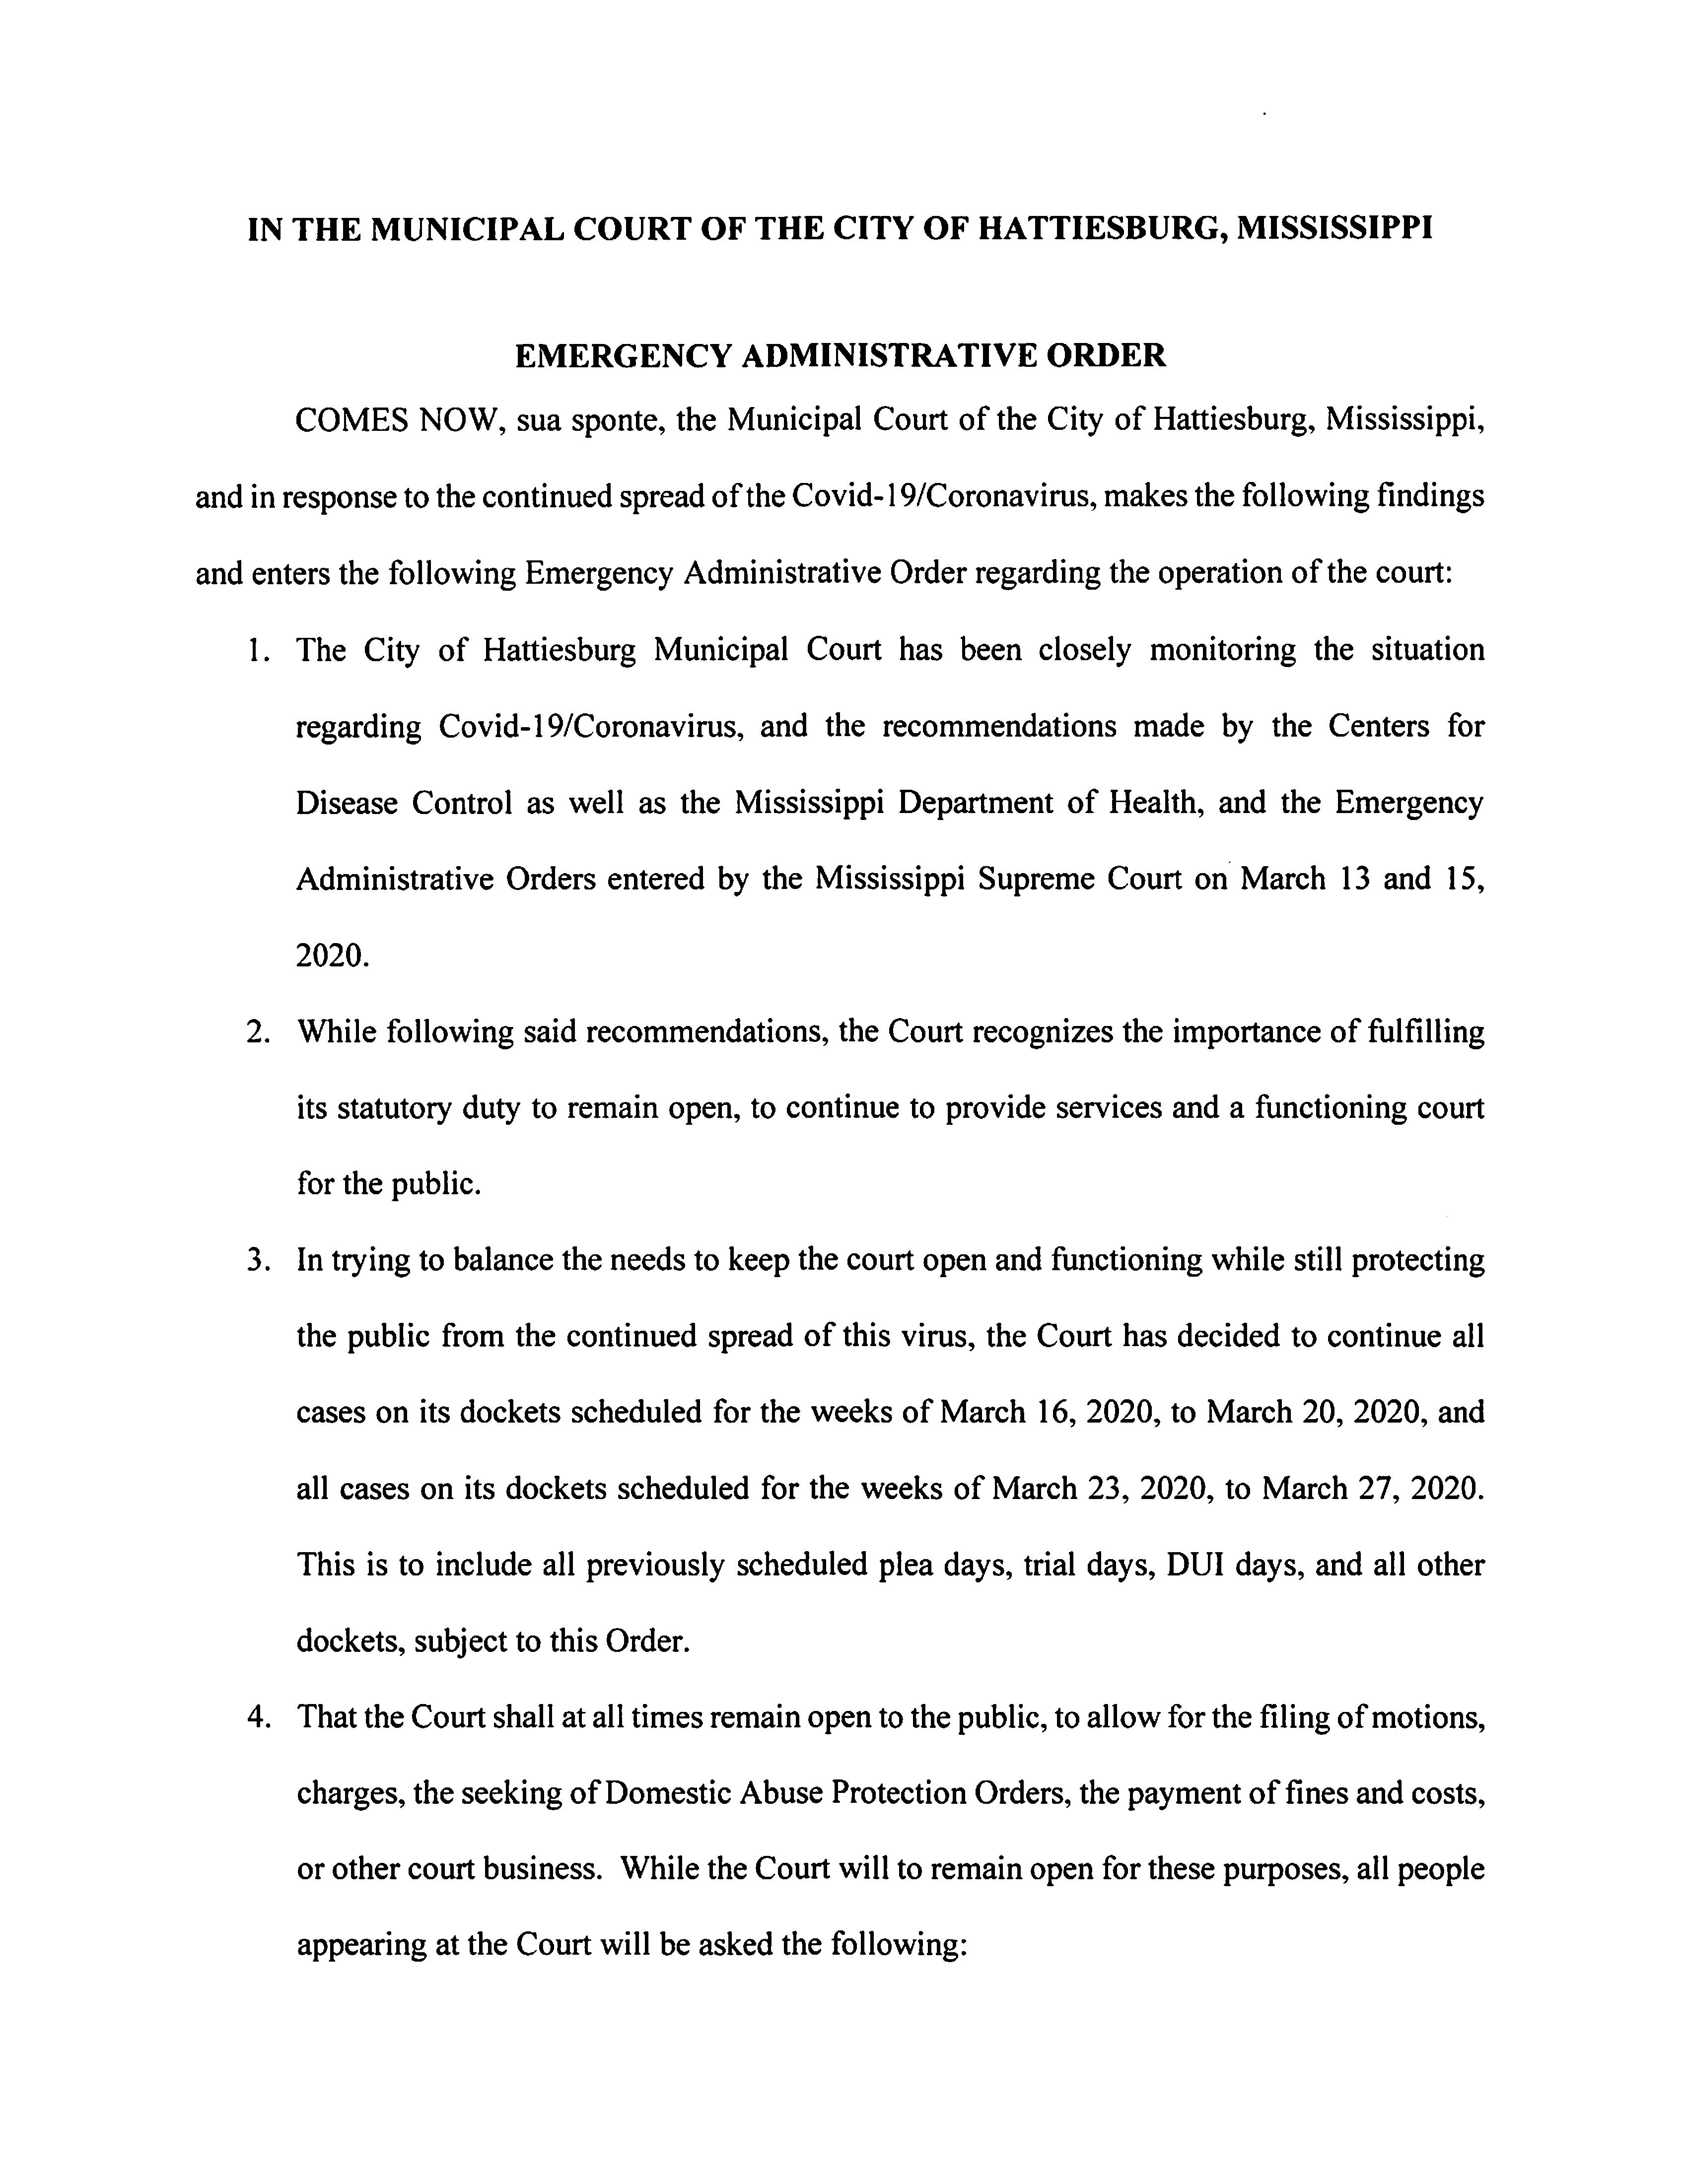 judge_order_Page_1